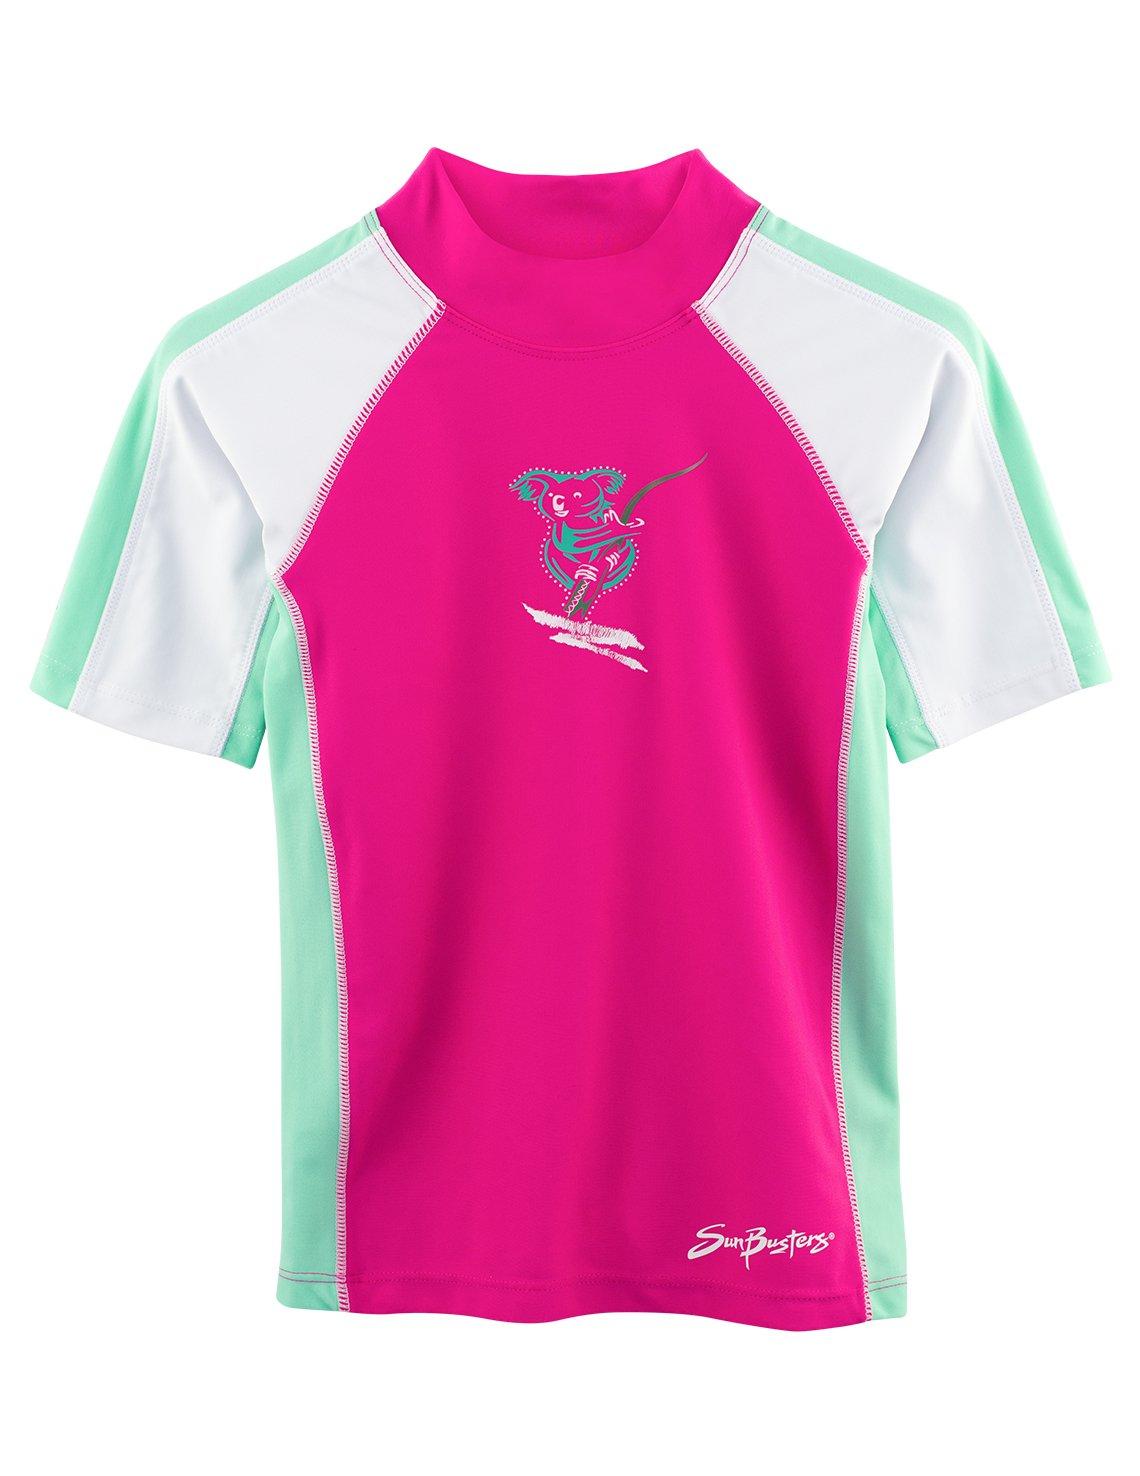 SunBusters Girls Short Sleeve Rash Guard 12 mos - 12 yrs, UPF 50+ Sun Protection